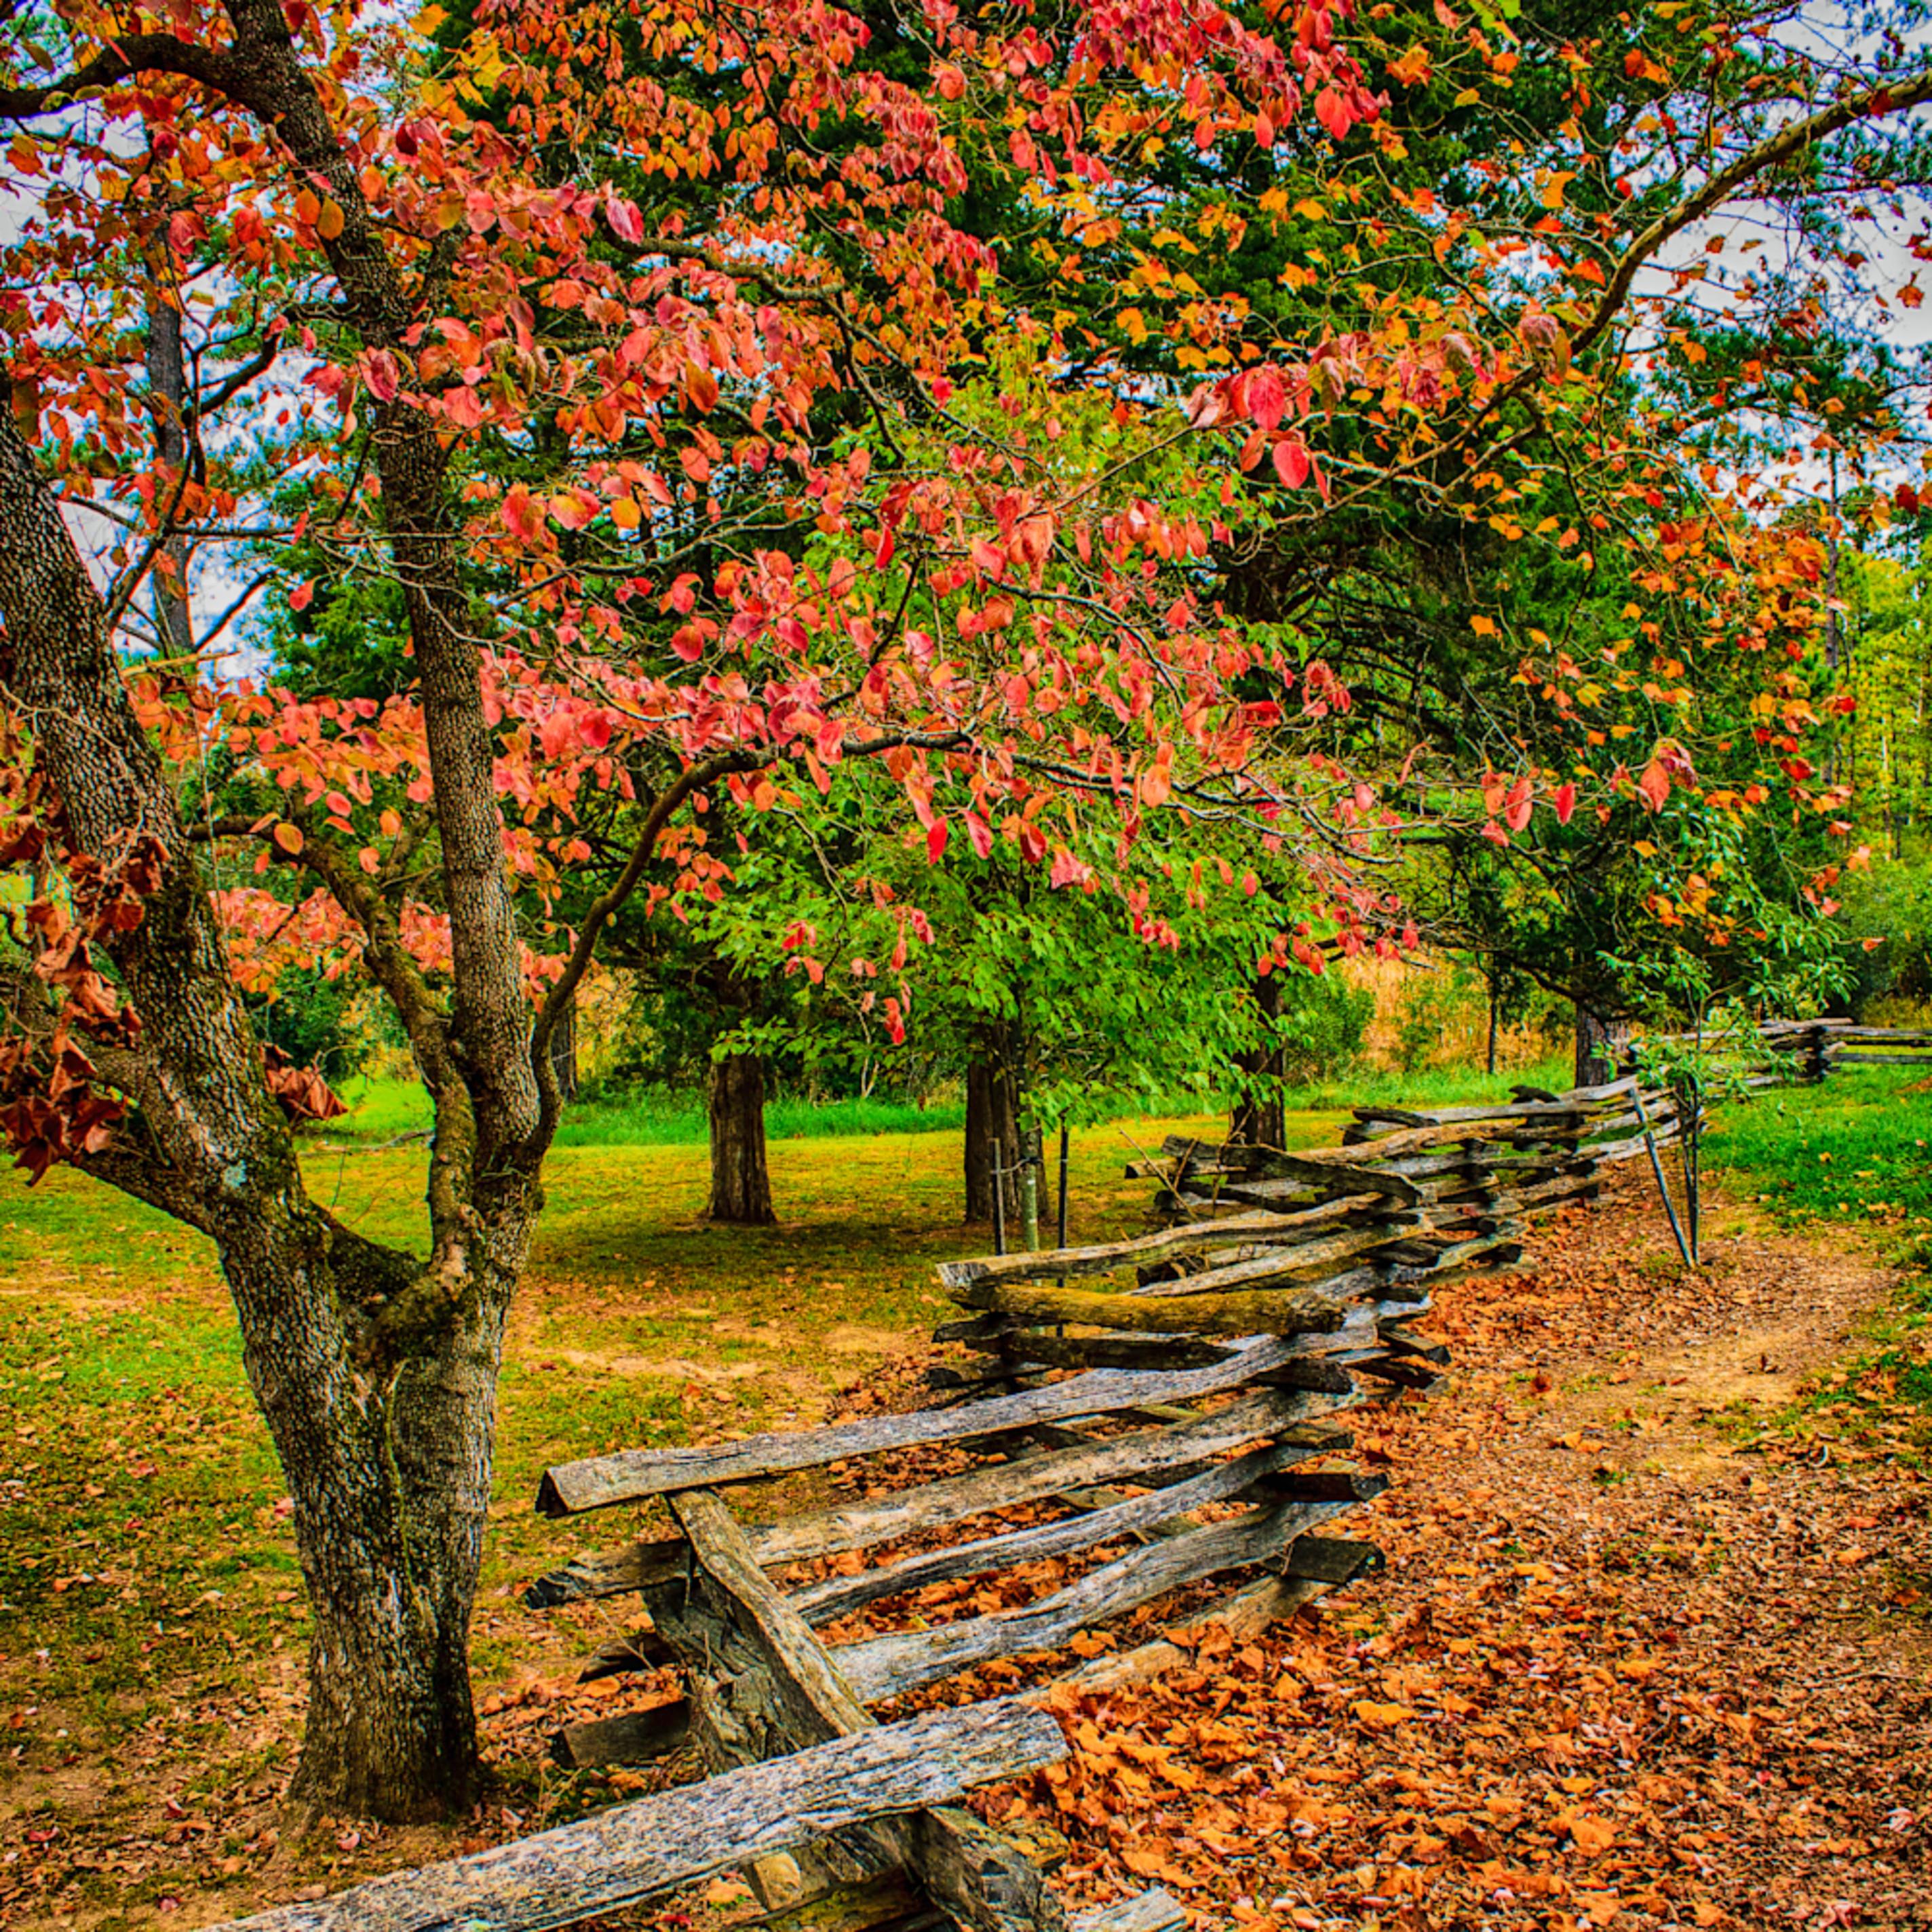 Autumn in virginia 1 of 1 llzyyd